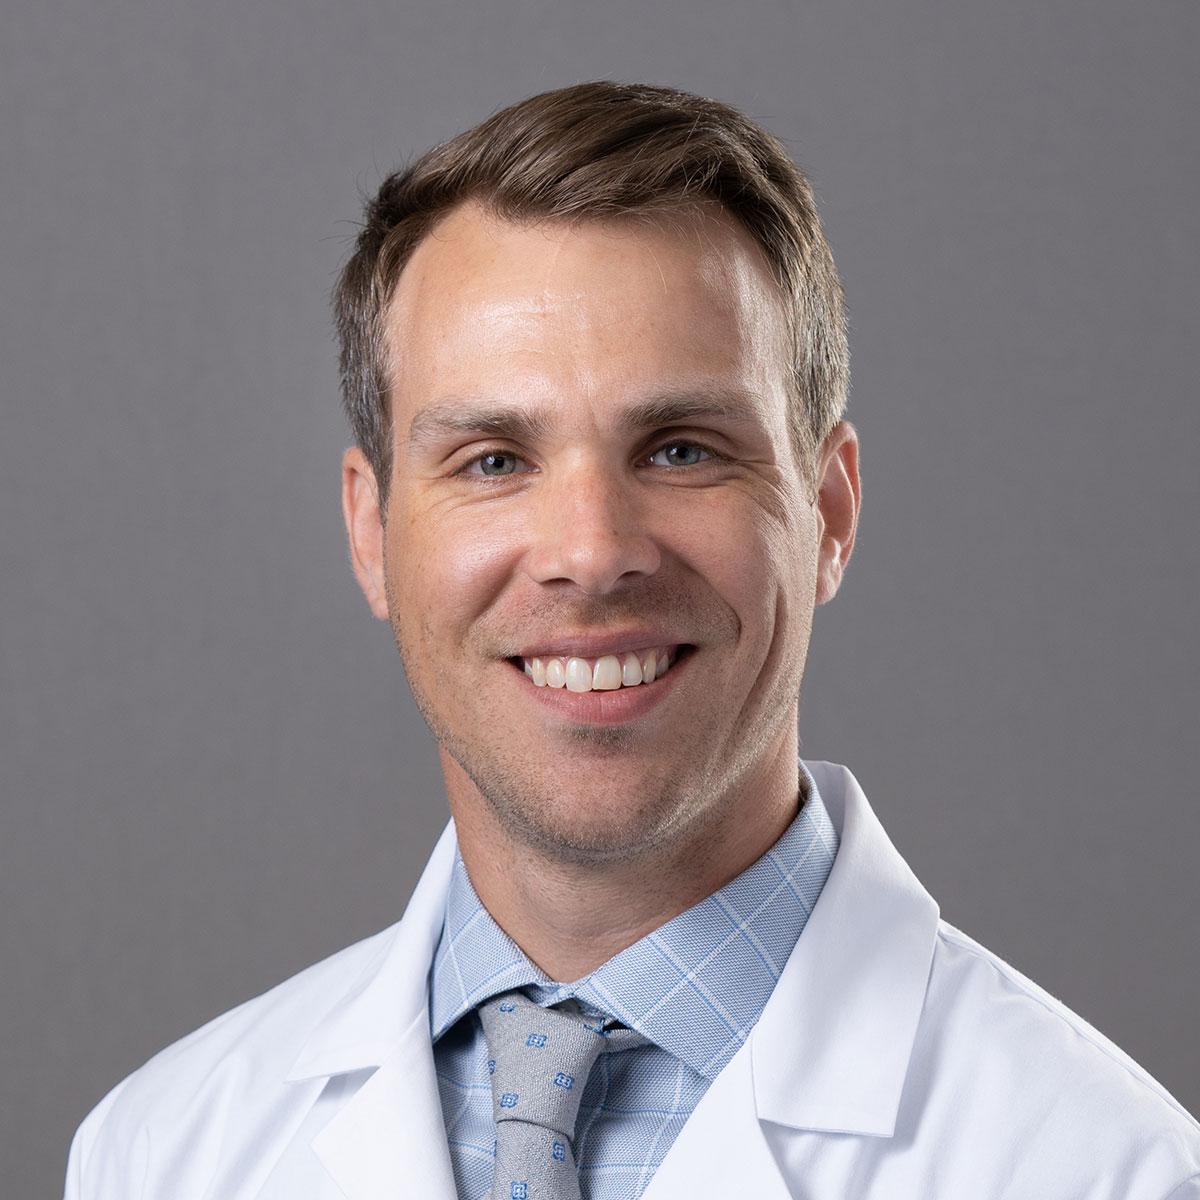 A friendly headshot of Dr. Michael Evans